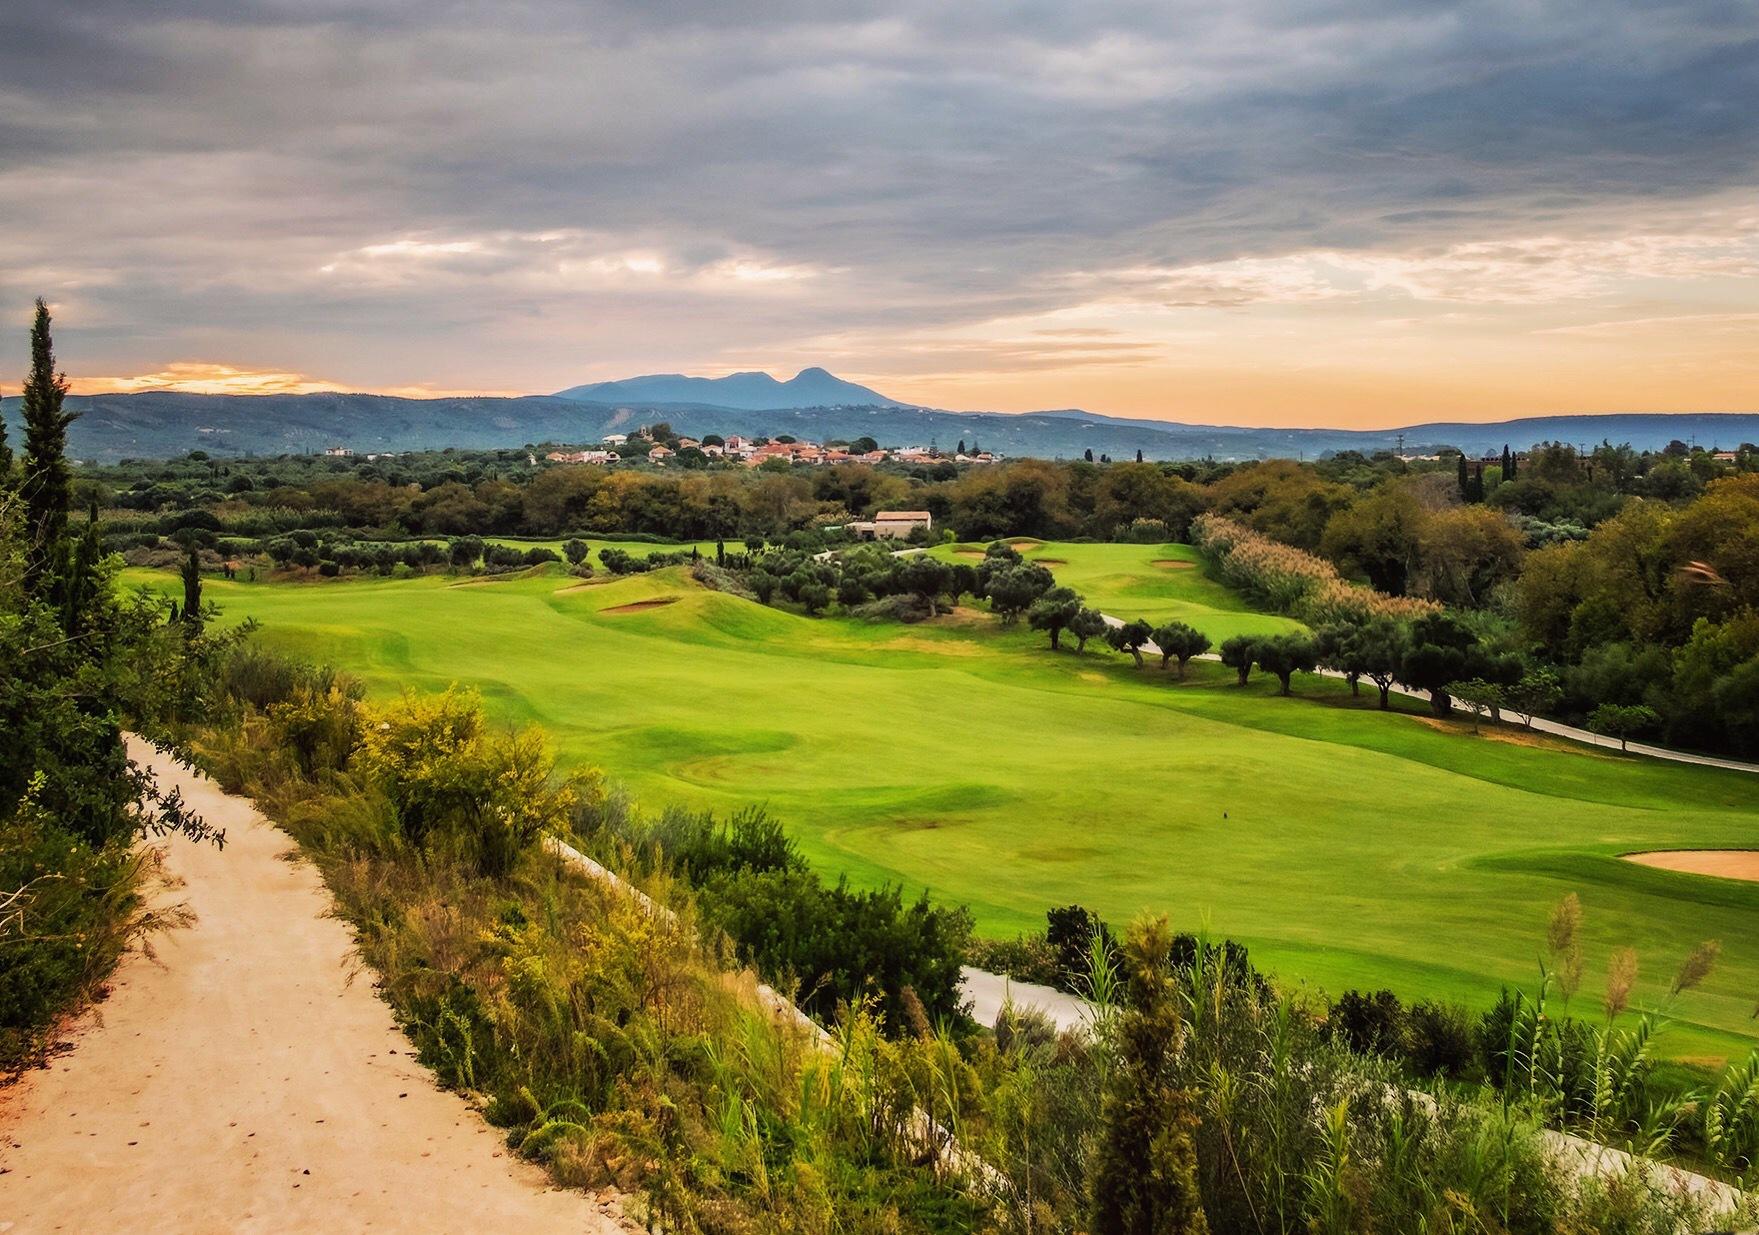 Golf morning by Par Soderman